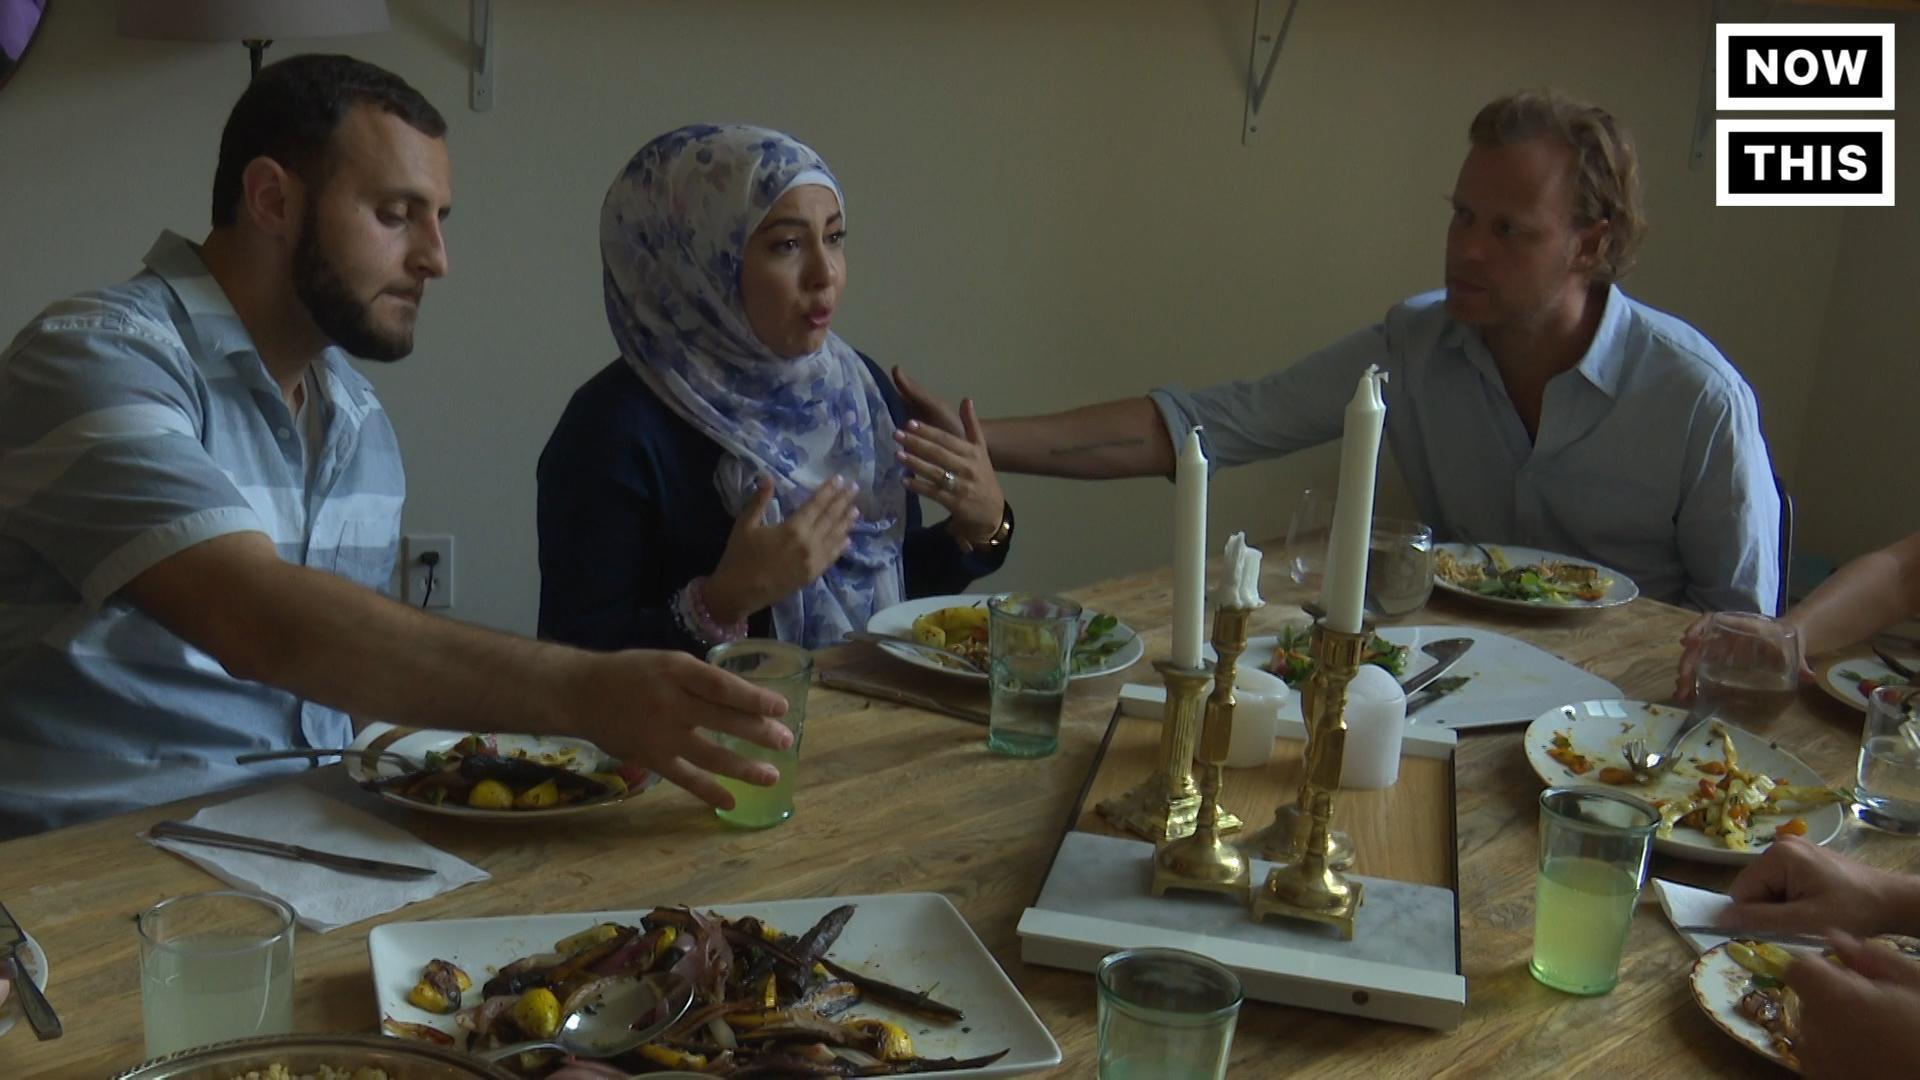 Dinner with Your Muslim Neighbor